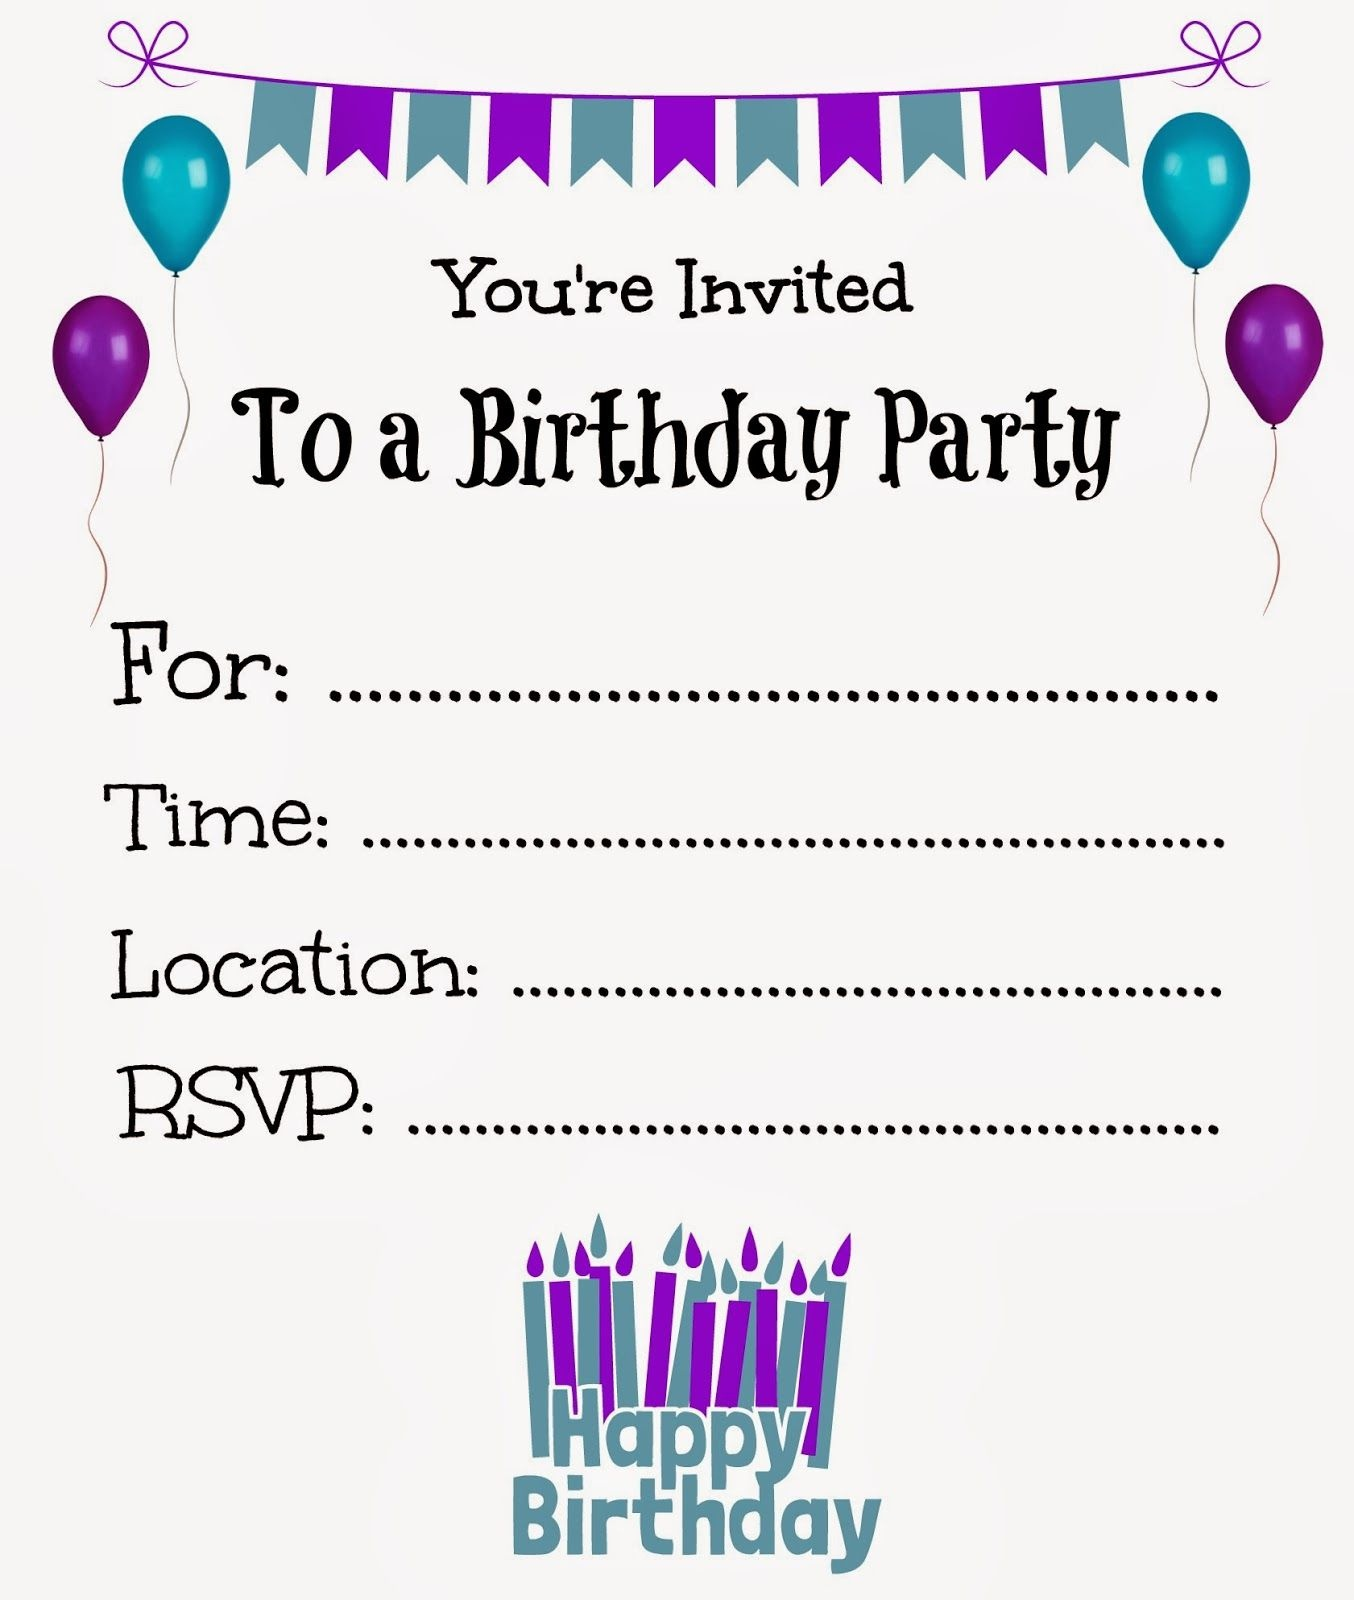 Free Printable Birthday Invitations For Kids #freeprintables - Free Printable Birthday Party Invitations